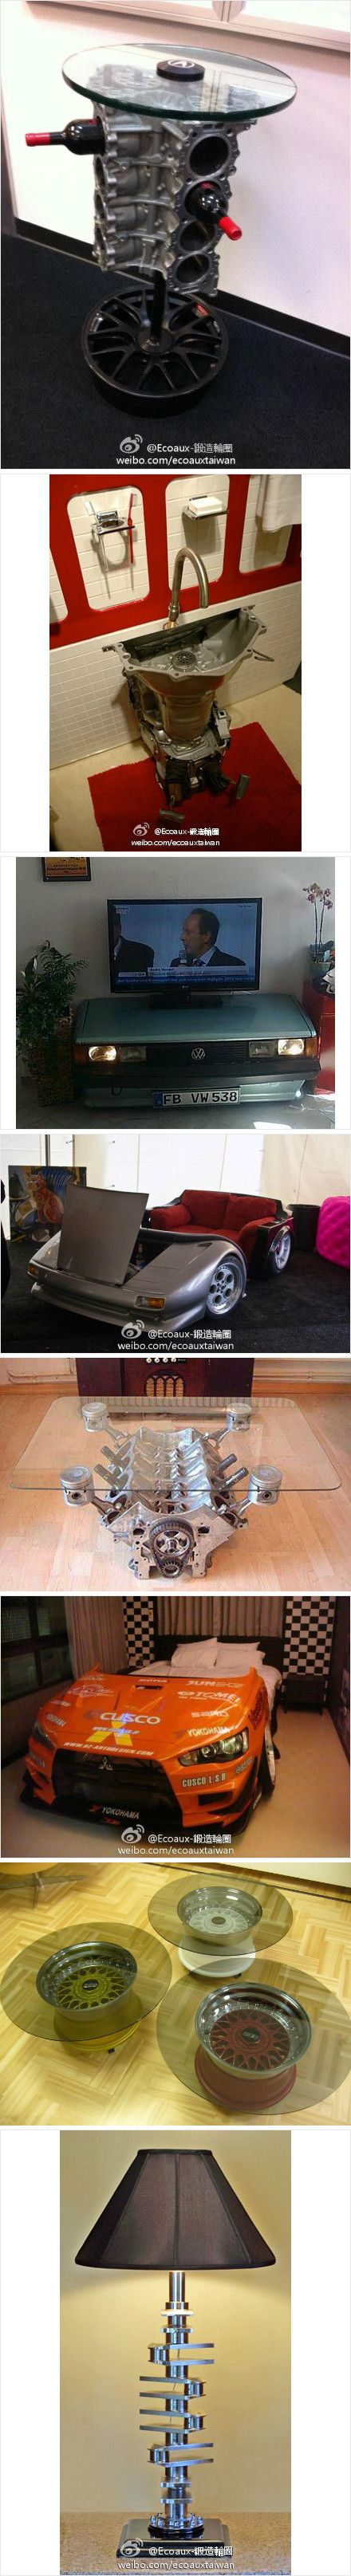 Pin von taylor smith auf awesome home ideas pinterest - Cars deckenlampe ...